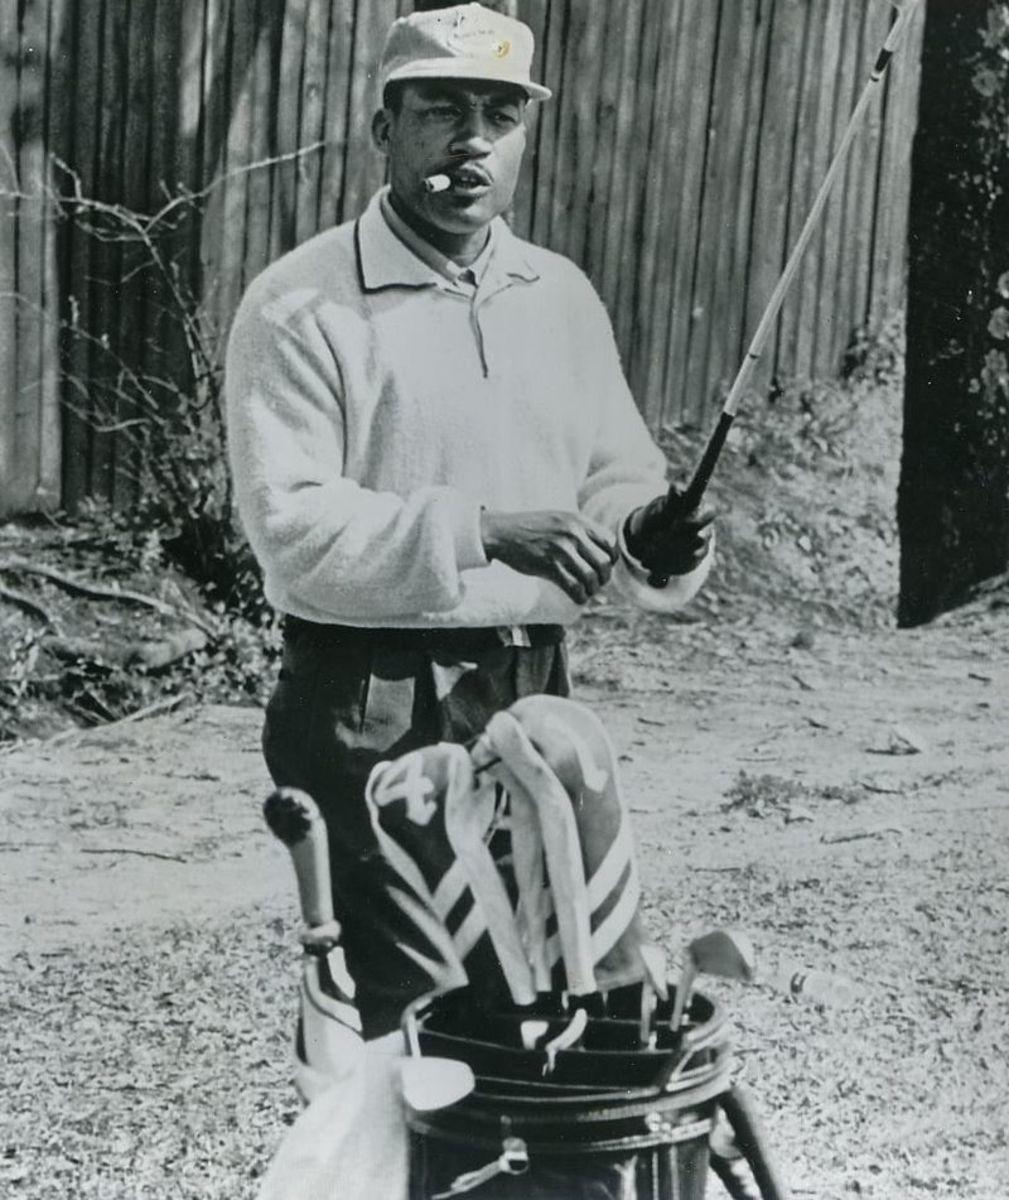 Charles Sifford 1961 winning PGA Card